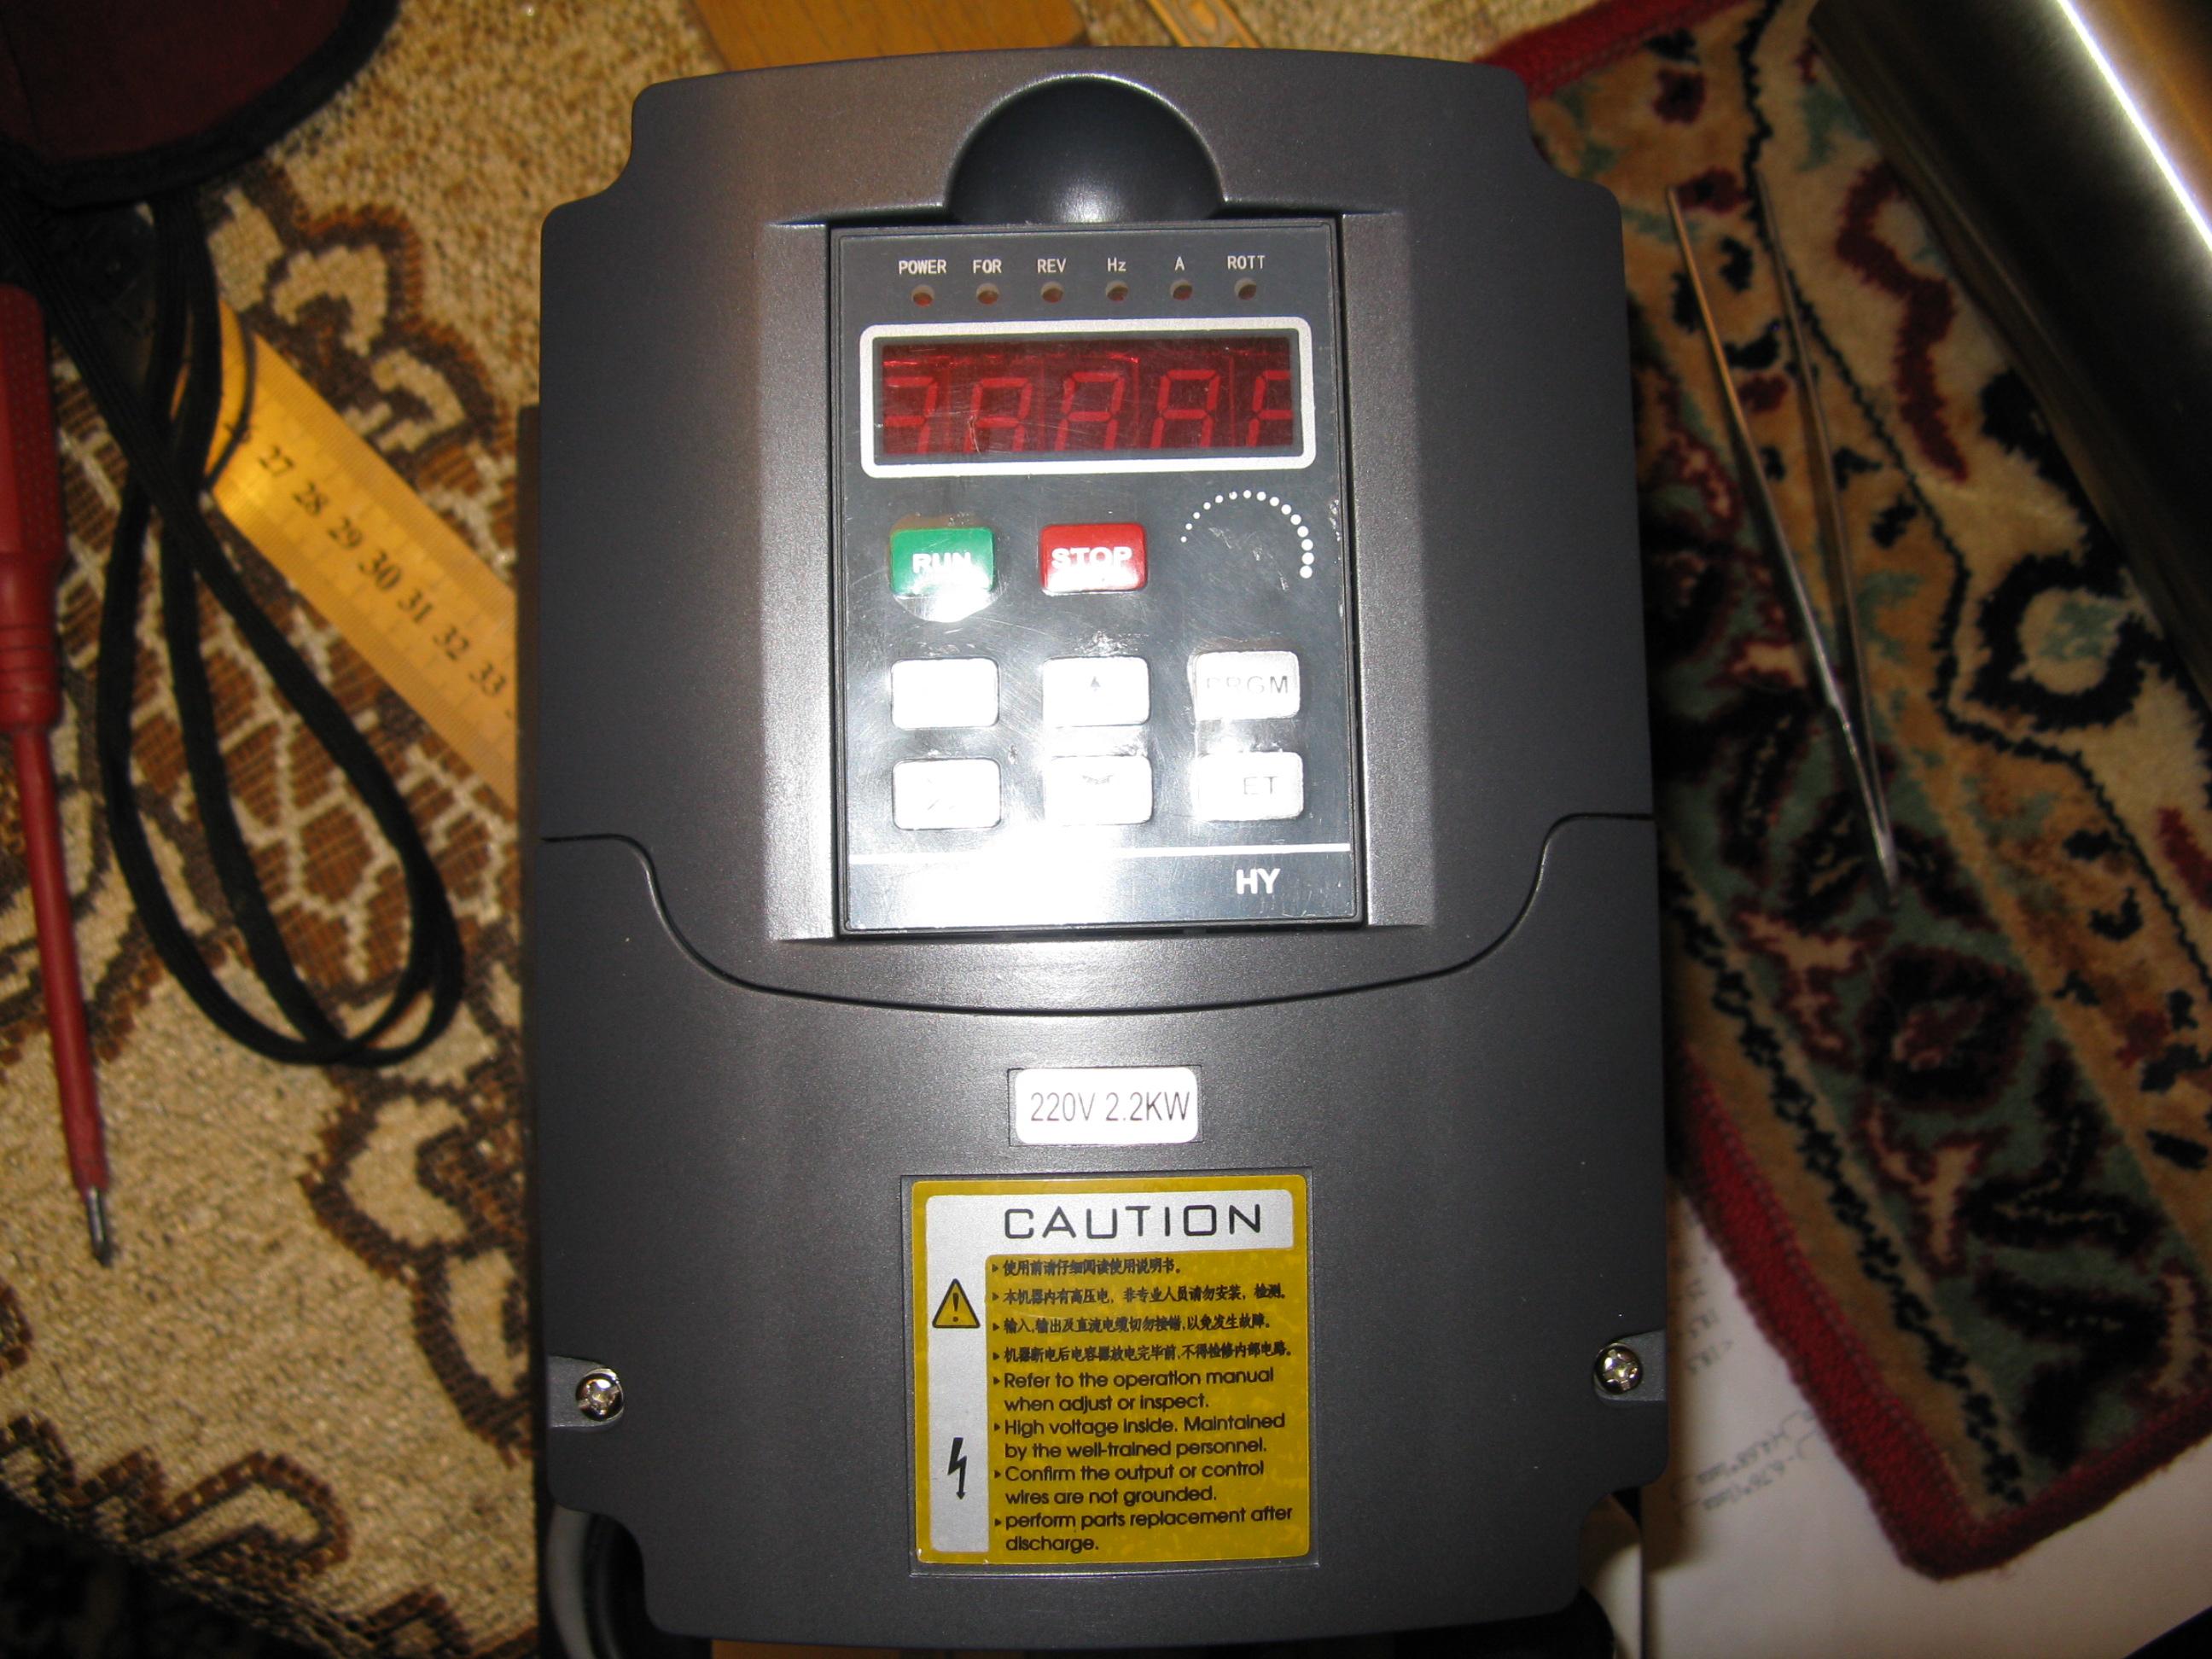 Huanyang inverter 2,2KW - Modyfikacja panelu sterowania